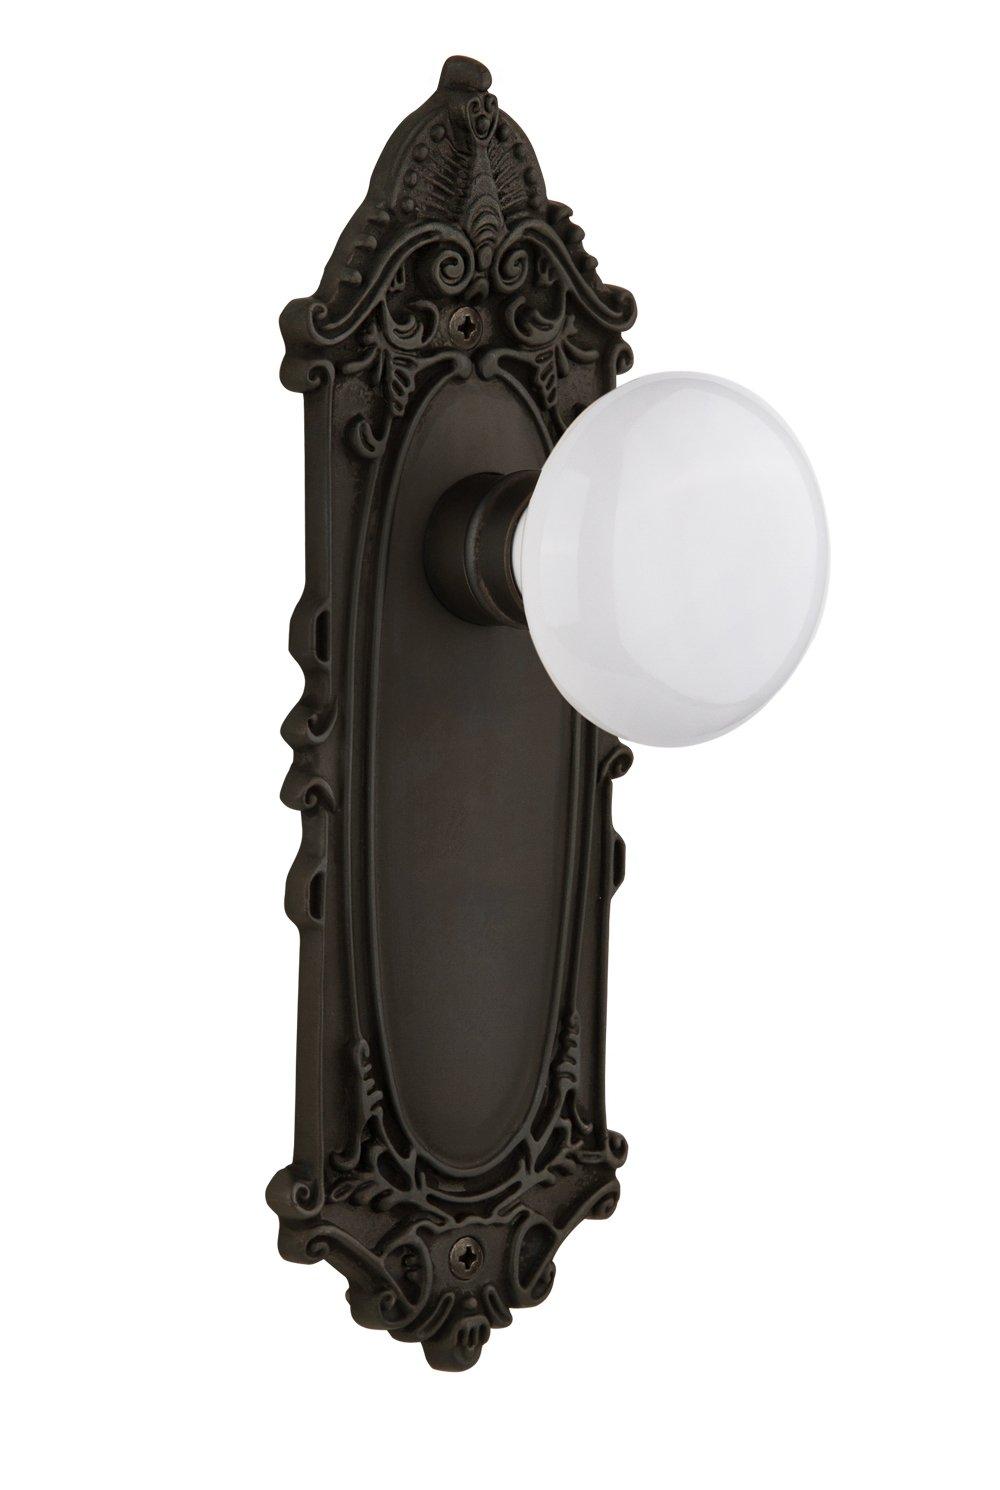 Nostalgic Warehouse Victorian Plate with White Porcelain Knob Satin Nickel Single Dummy